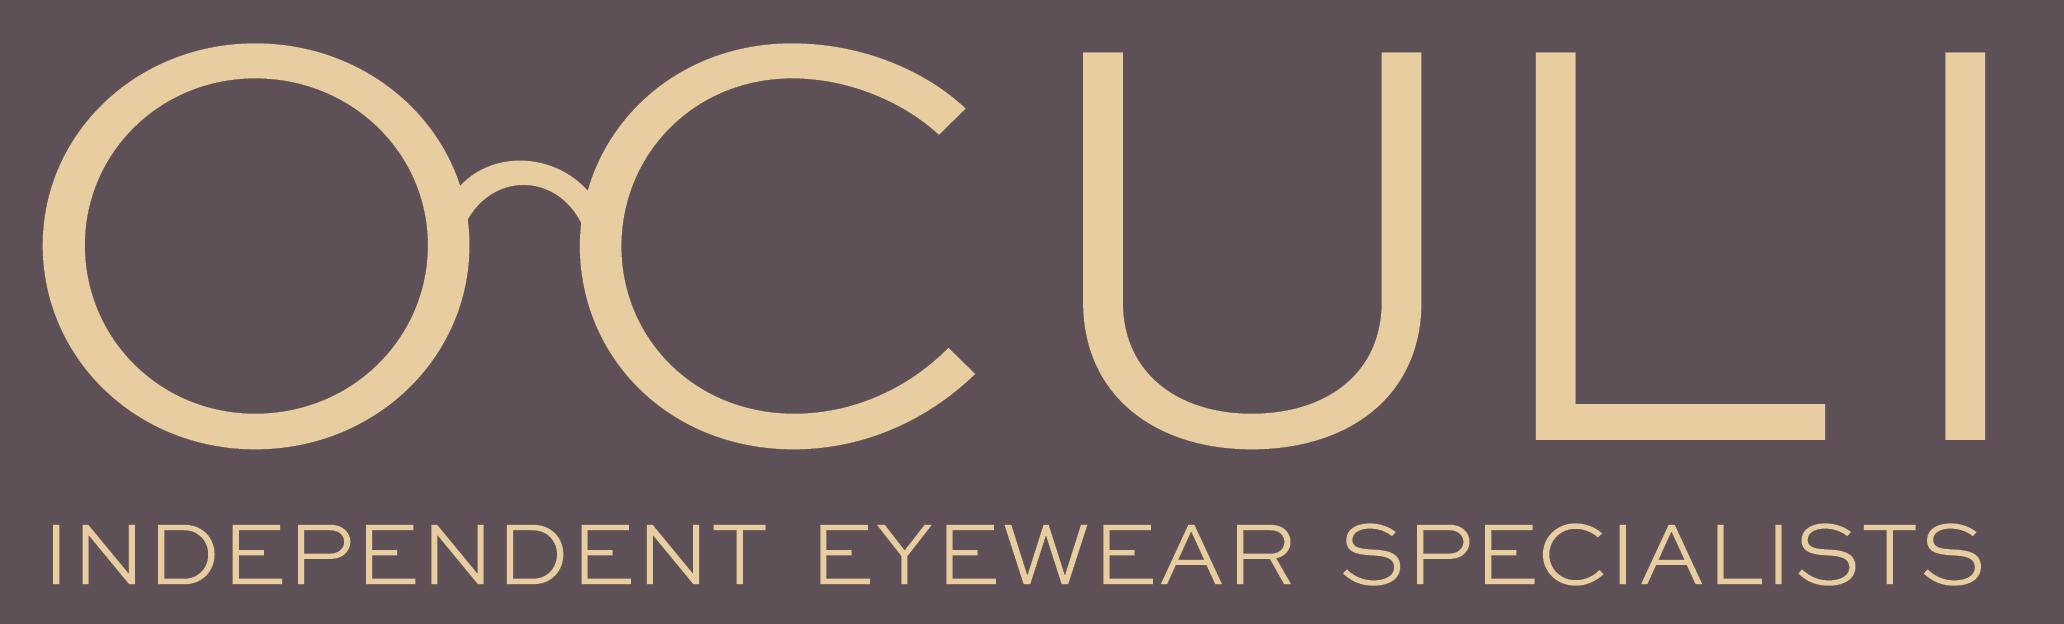 Oculi Independent Opticians Chesterfield